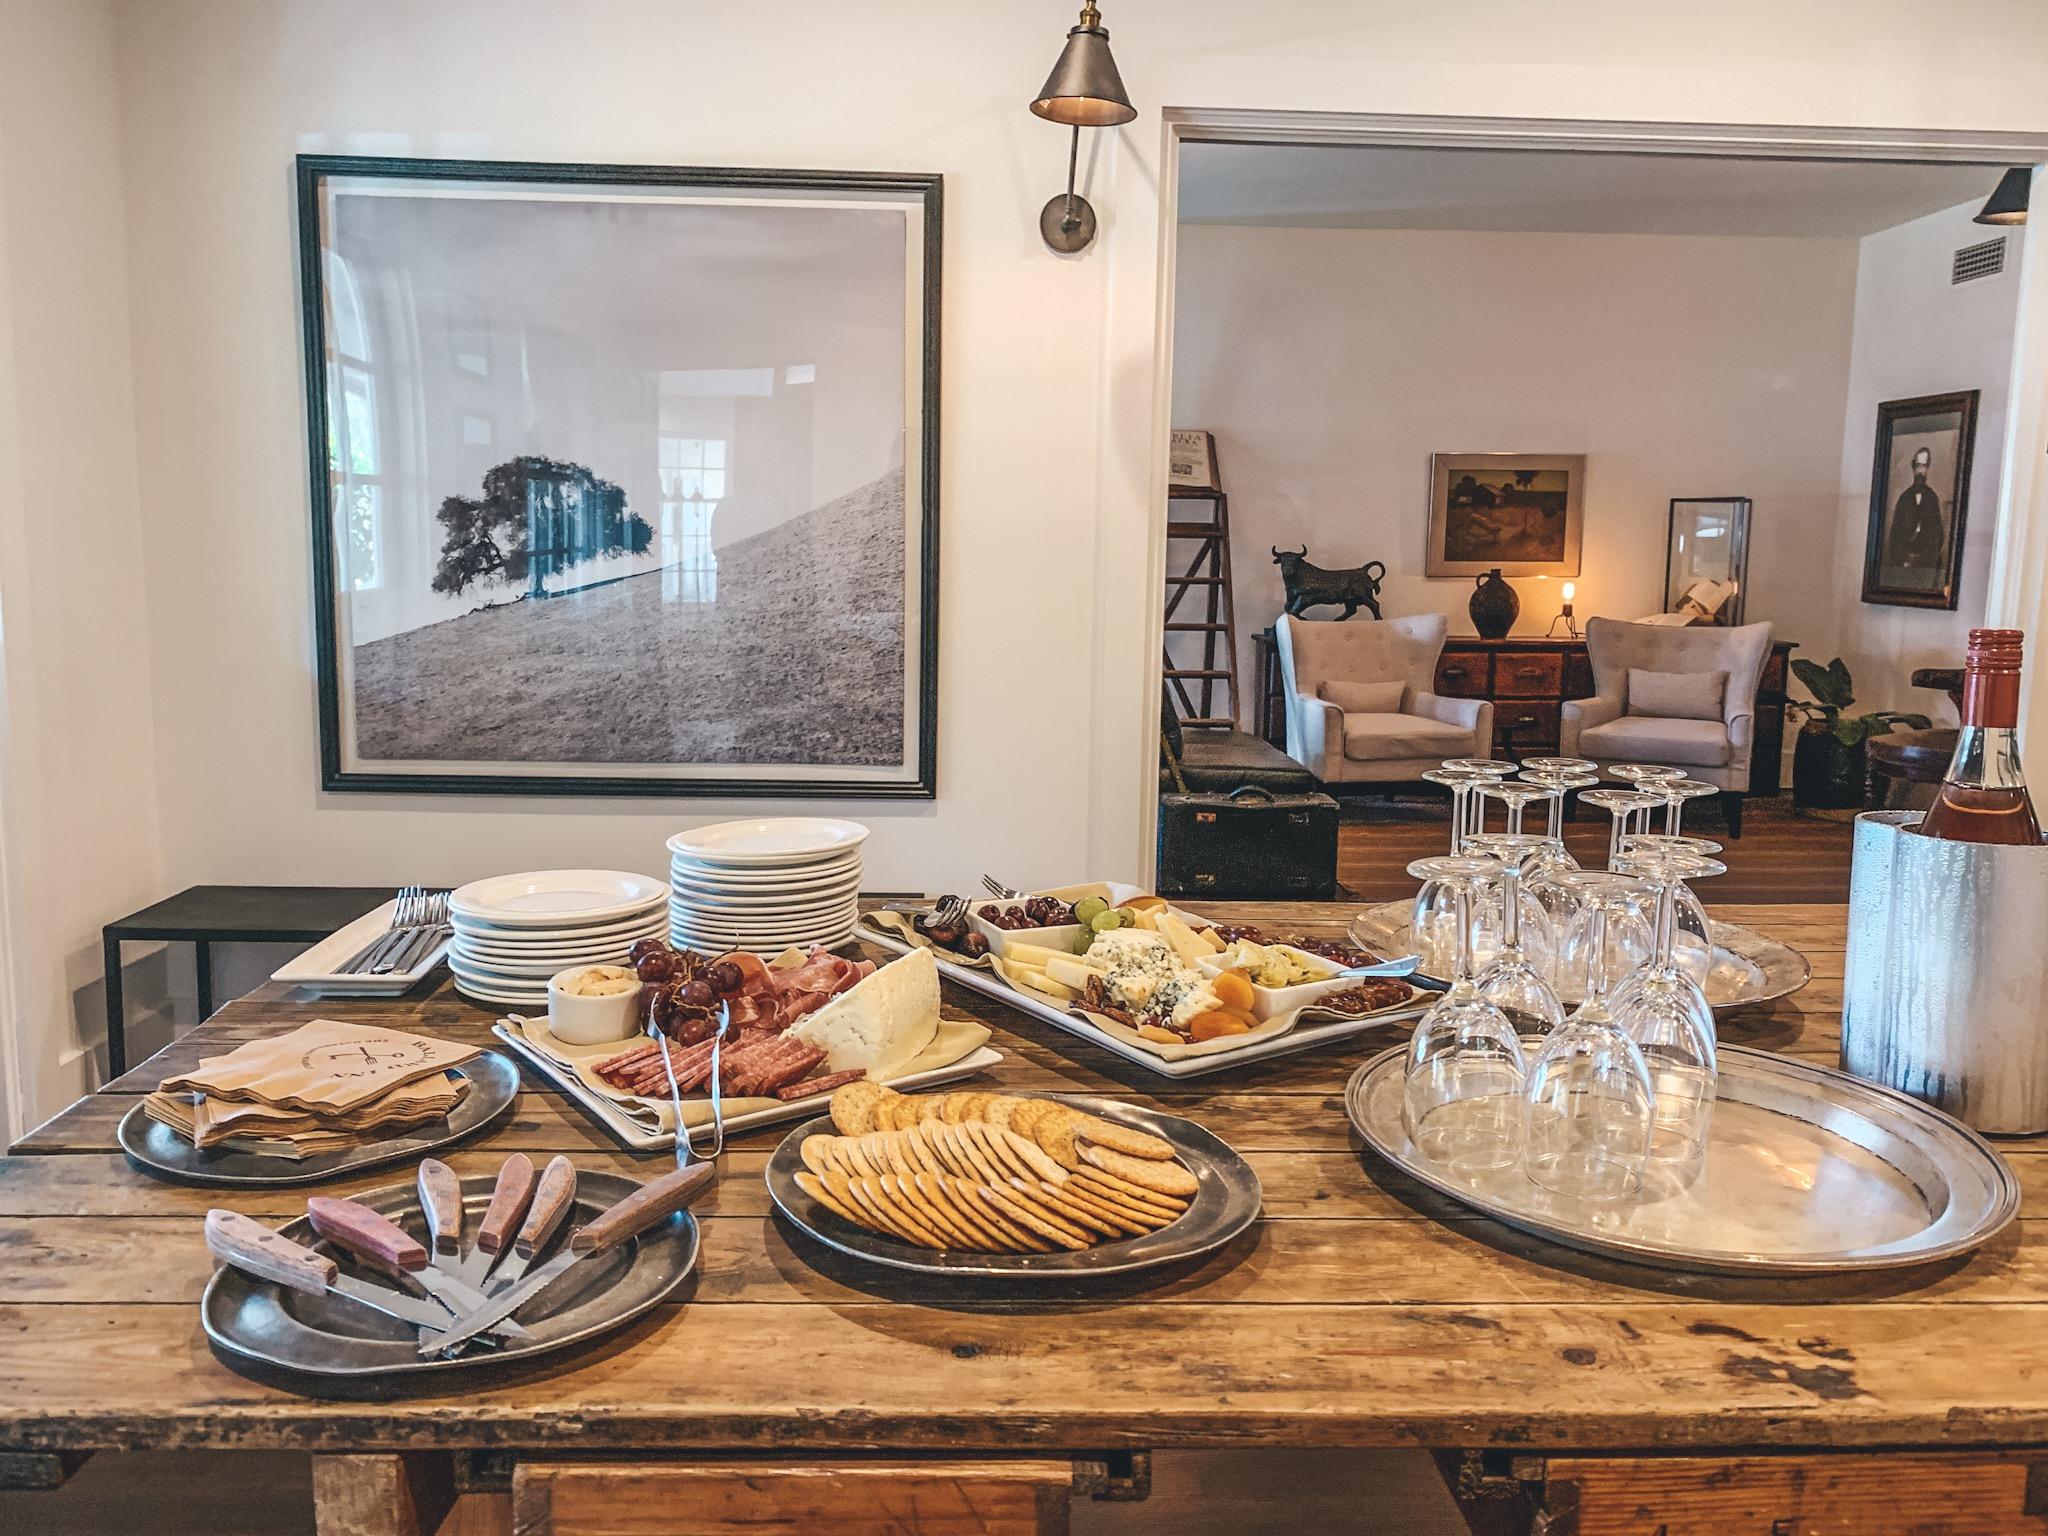 Ballard Inn and The Gathering Table   Santa Barbara Wine Country   Erika Beach